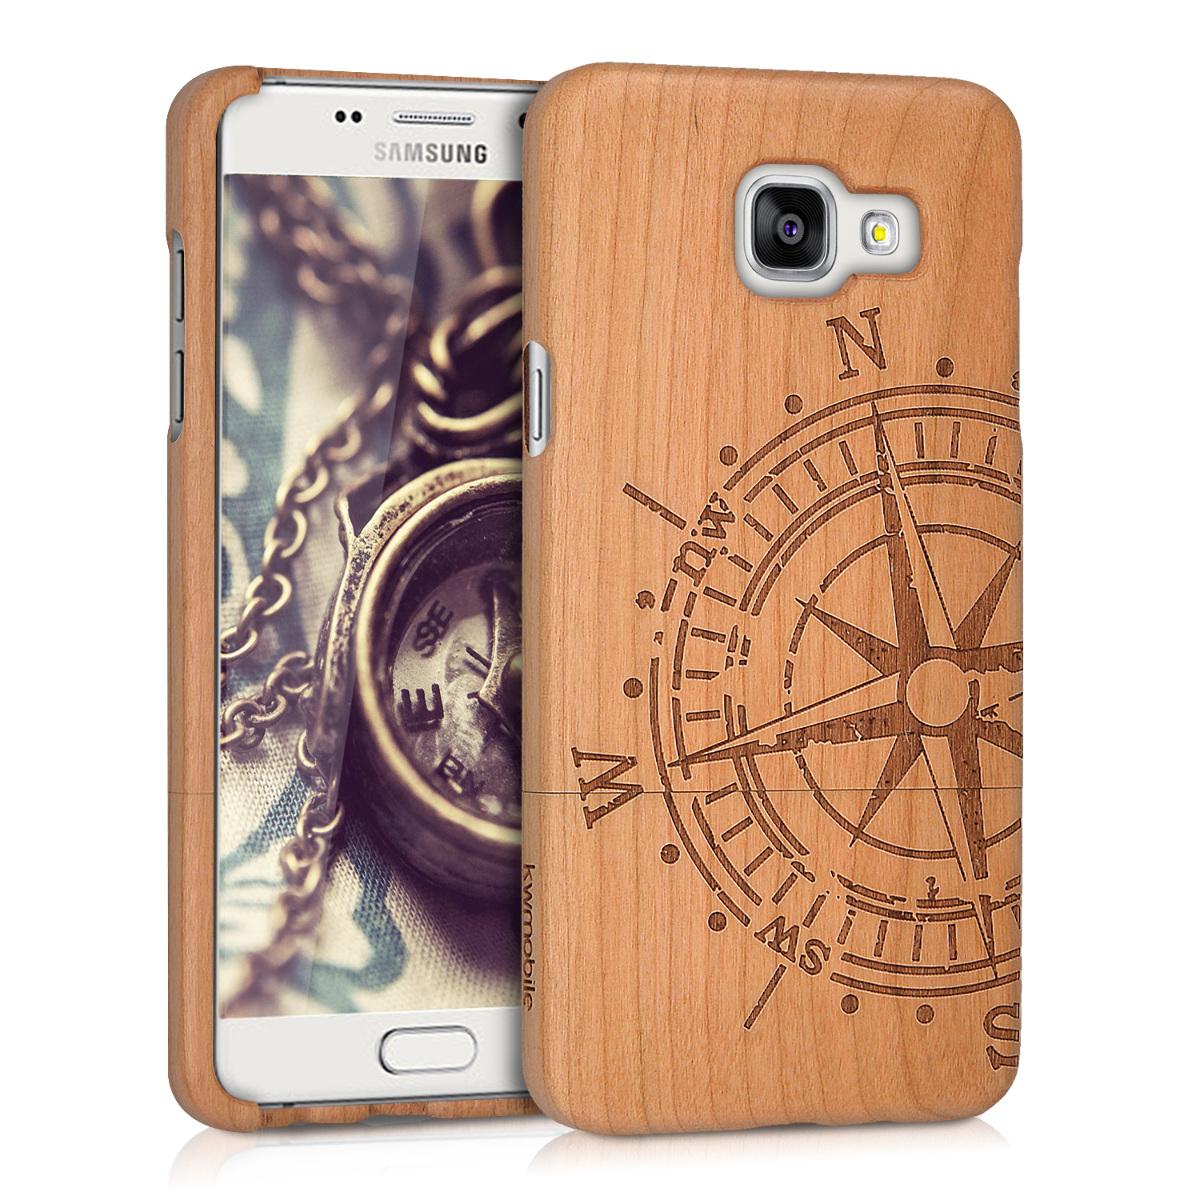 KW Σκληρή Ξύλινη Θήκη Samsung Galaxy A5 (2016) (37936.05)